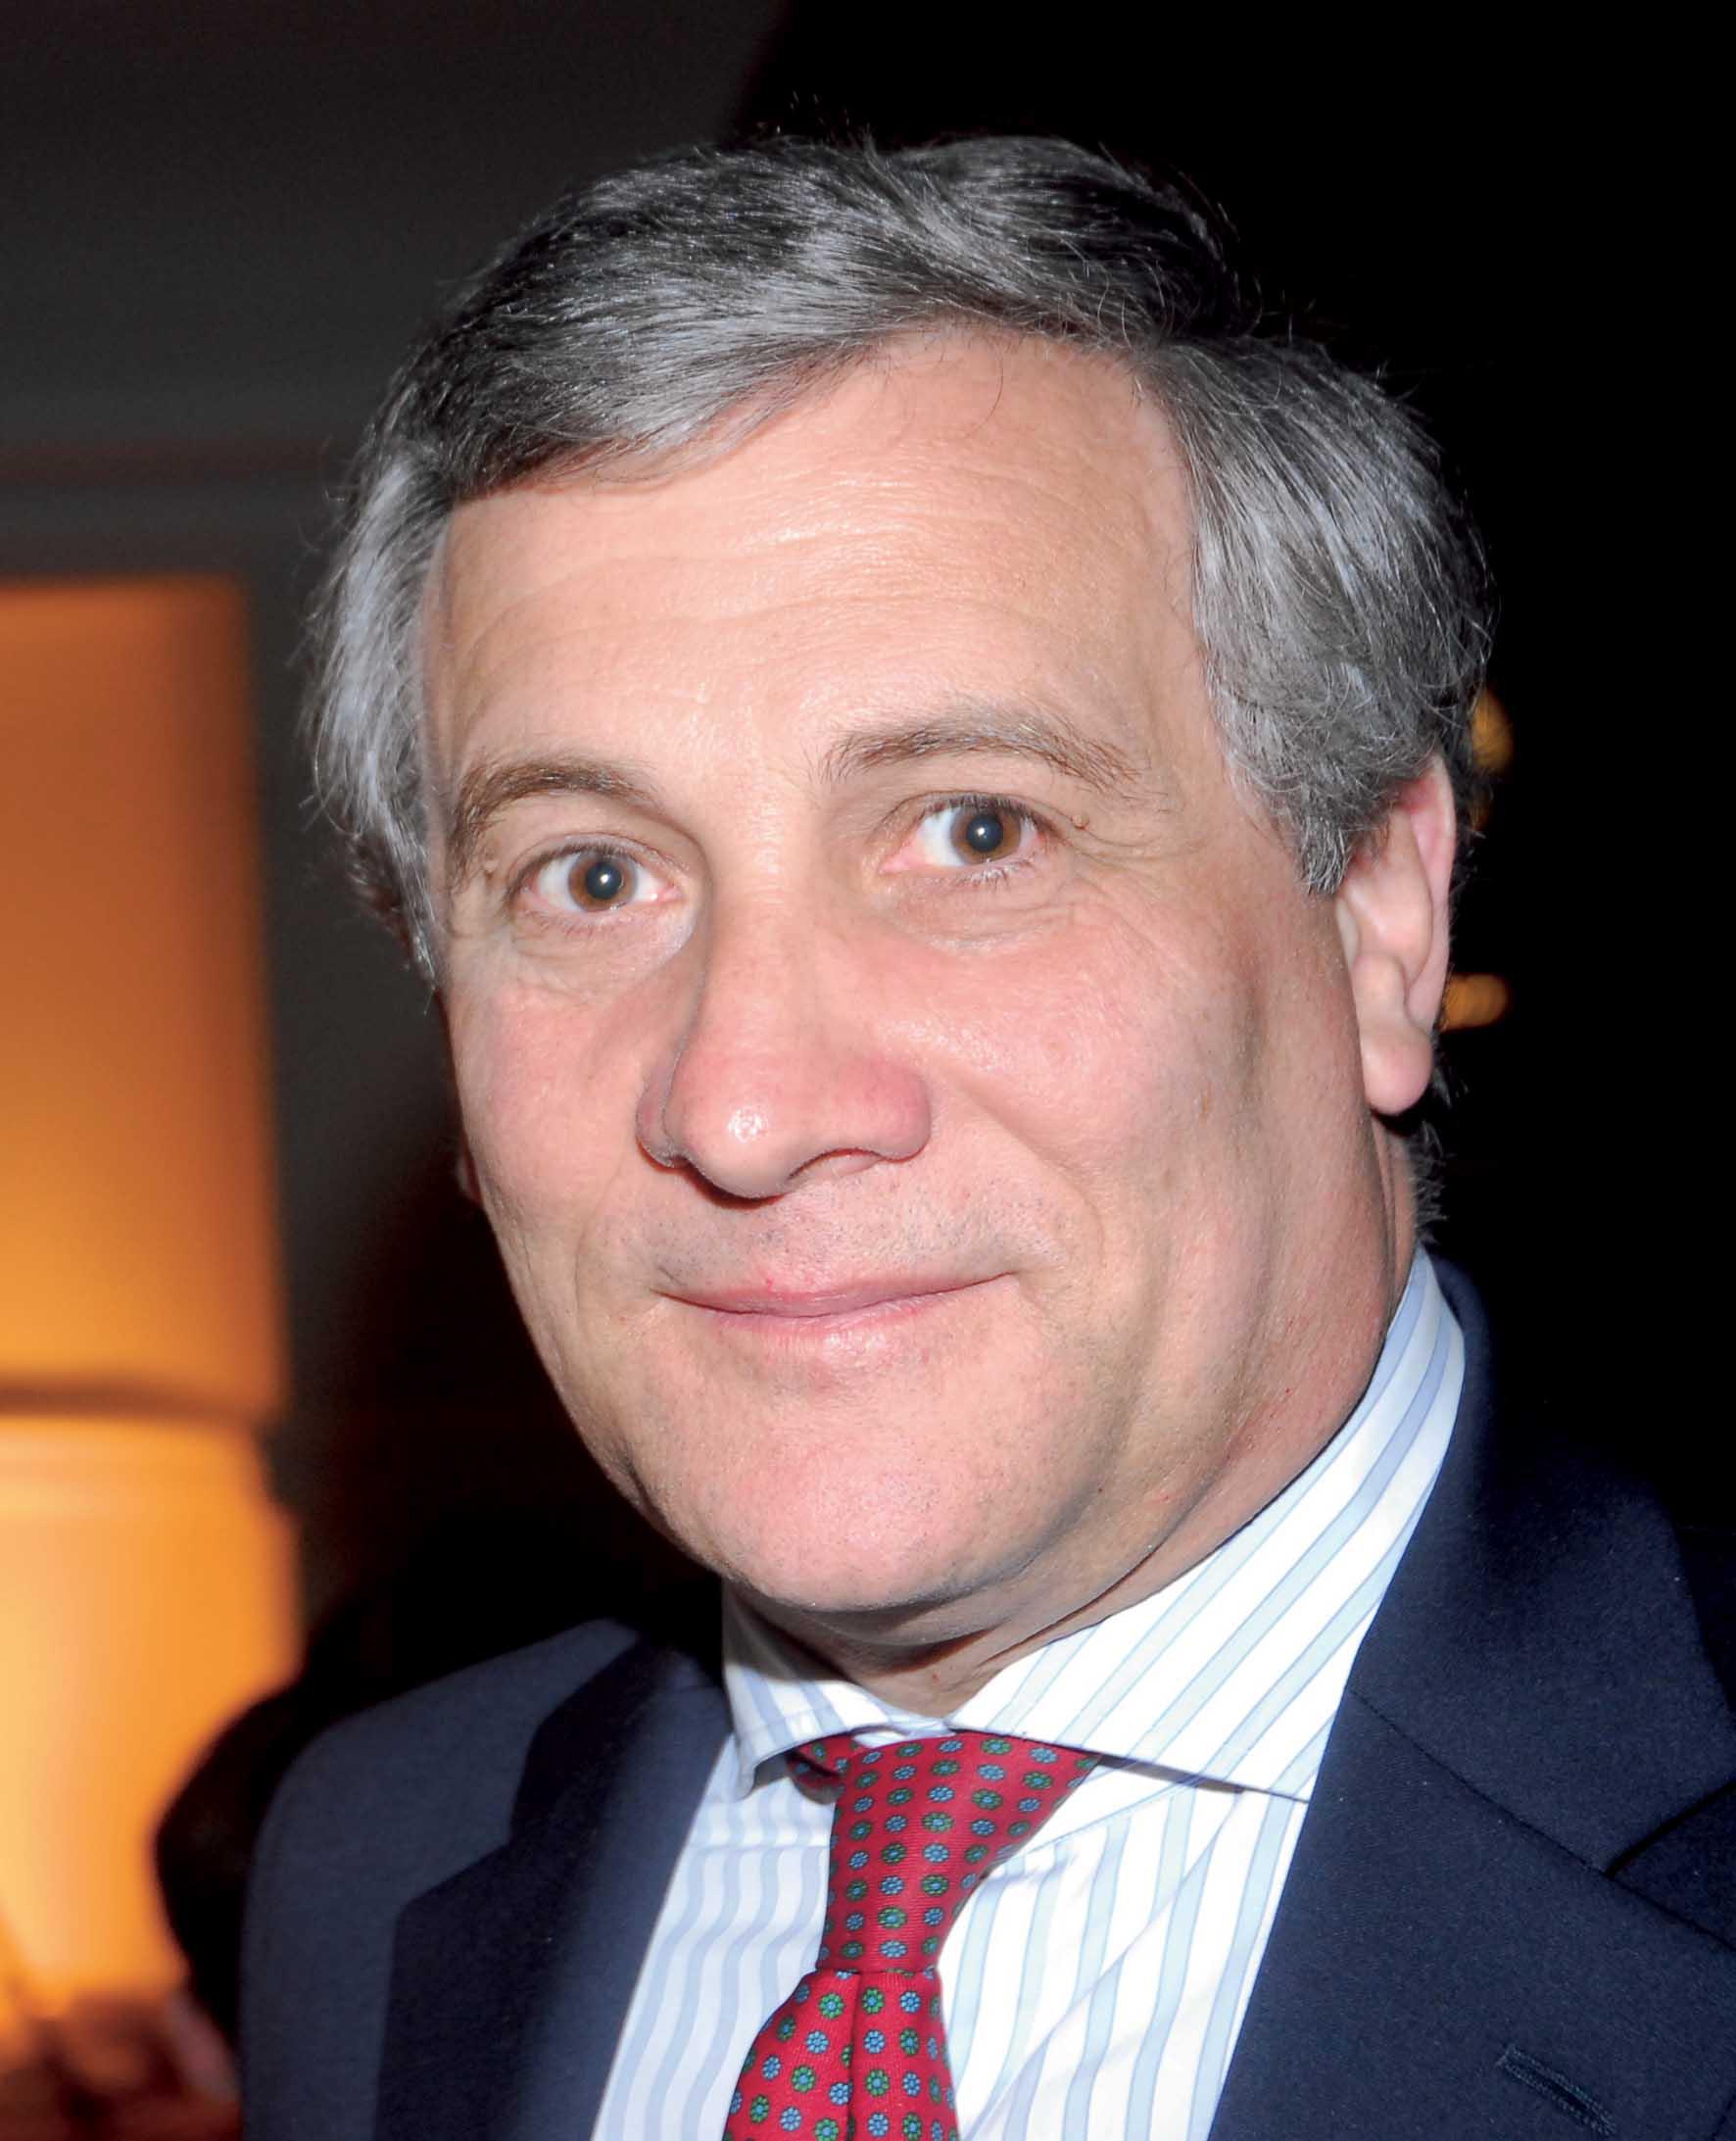 antonio-tajani-vicepresidente-commissione-UE-ilnordest